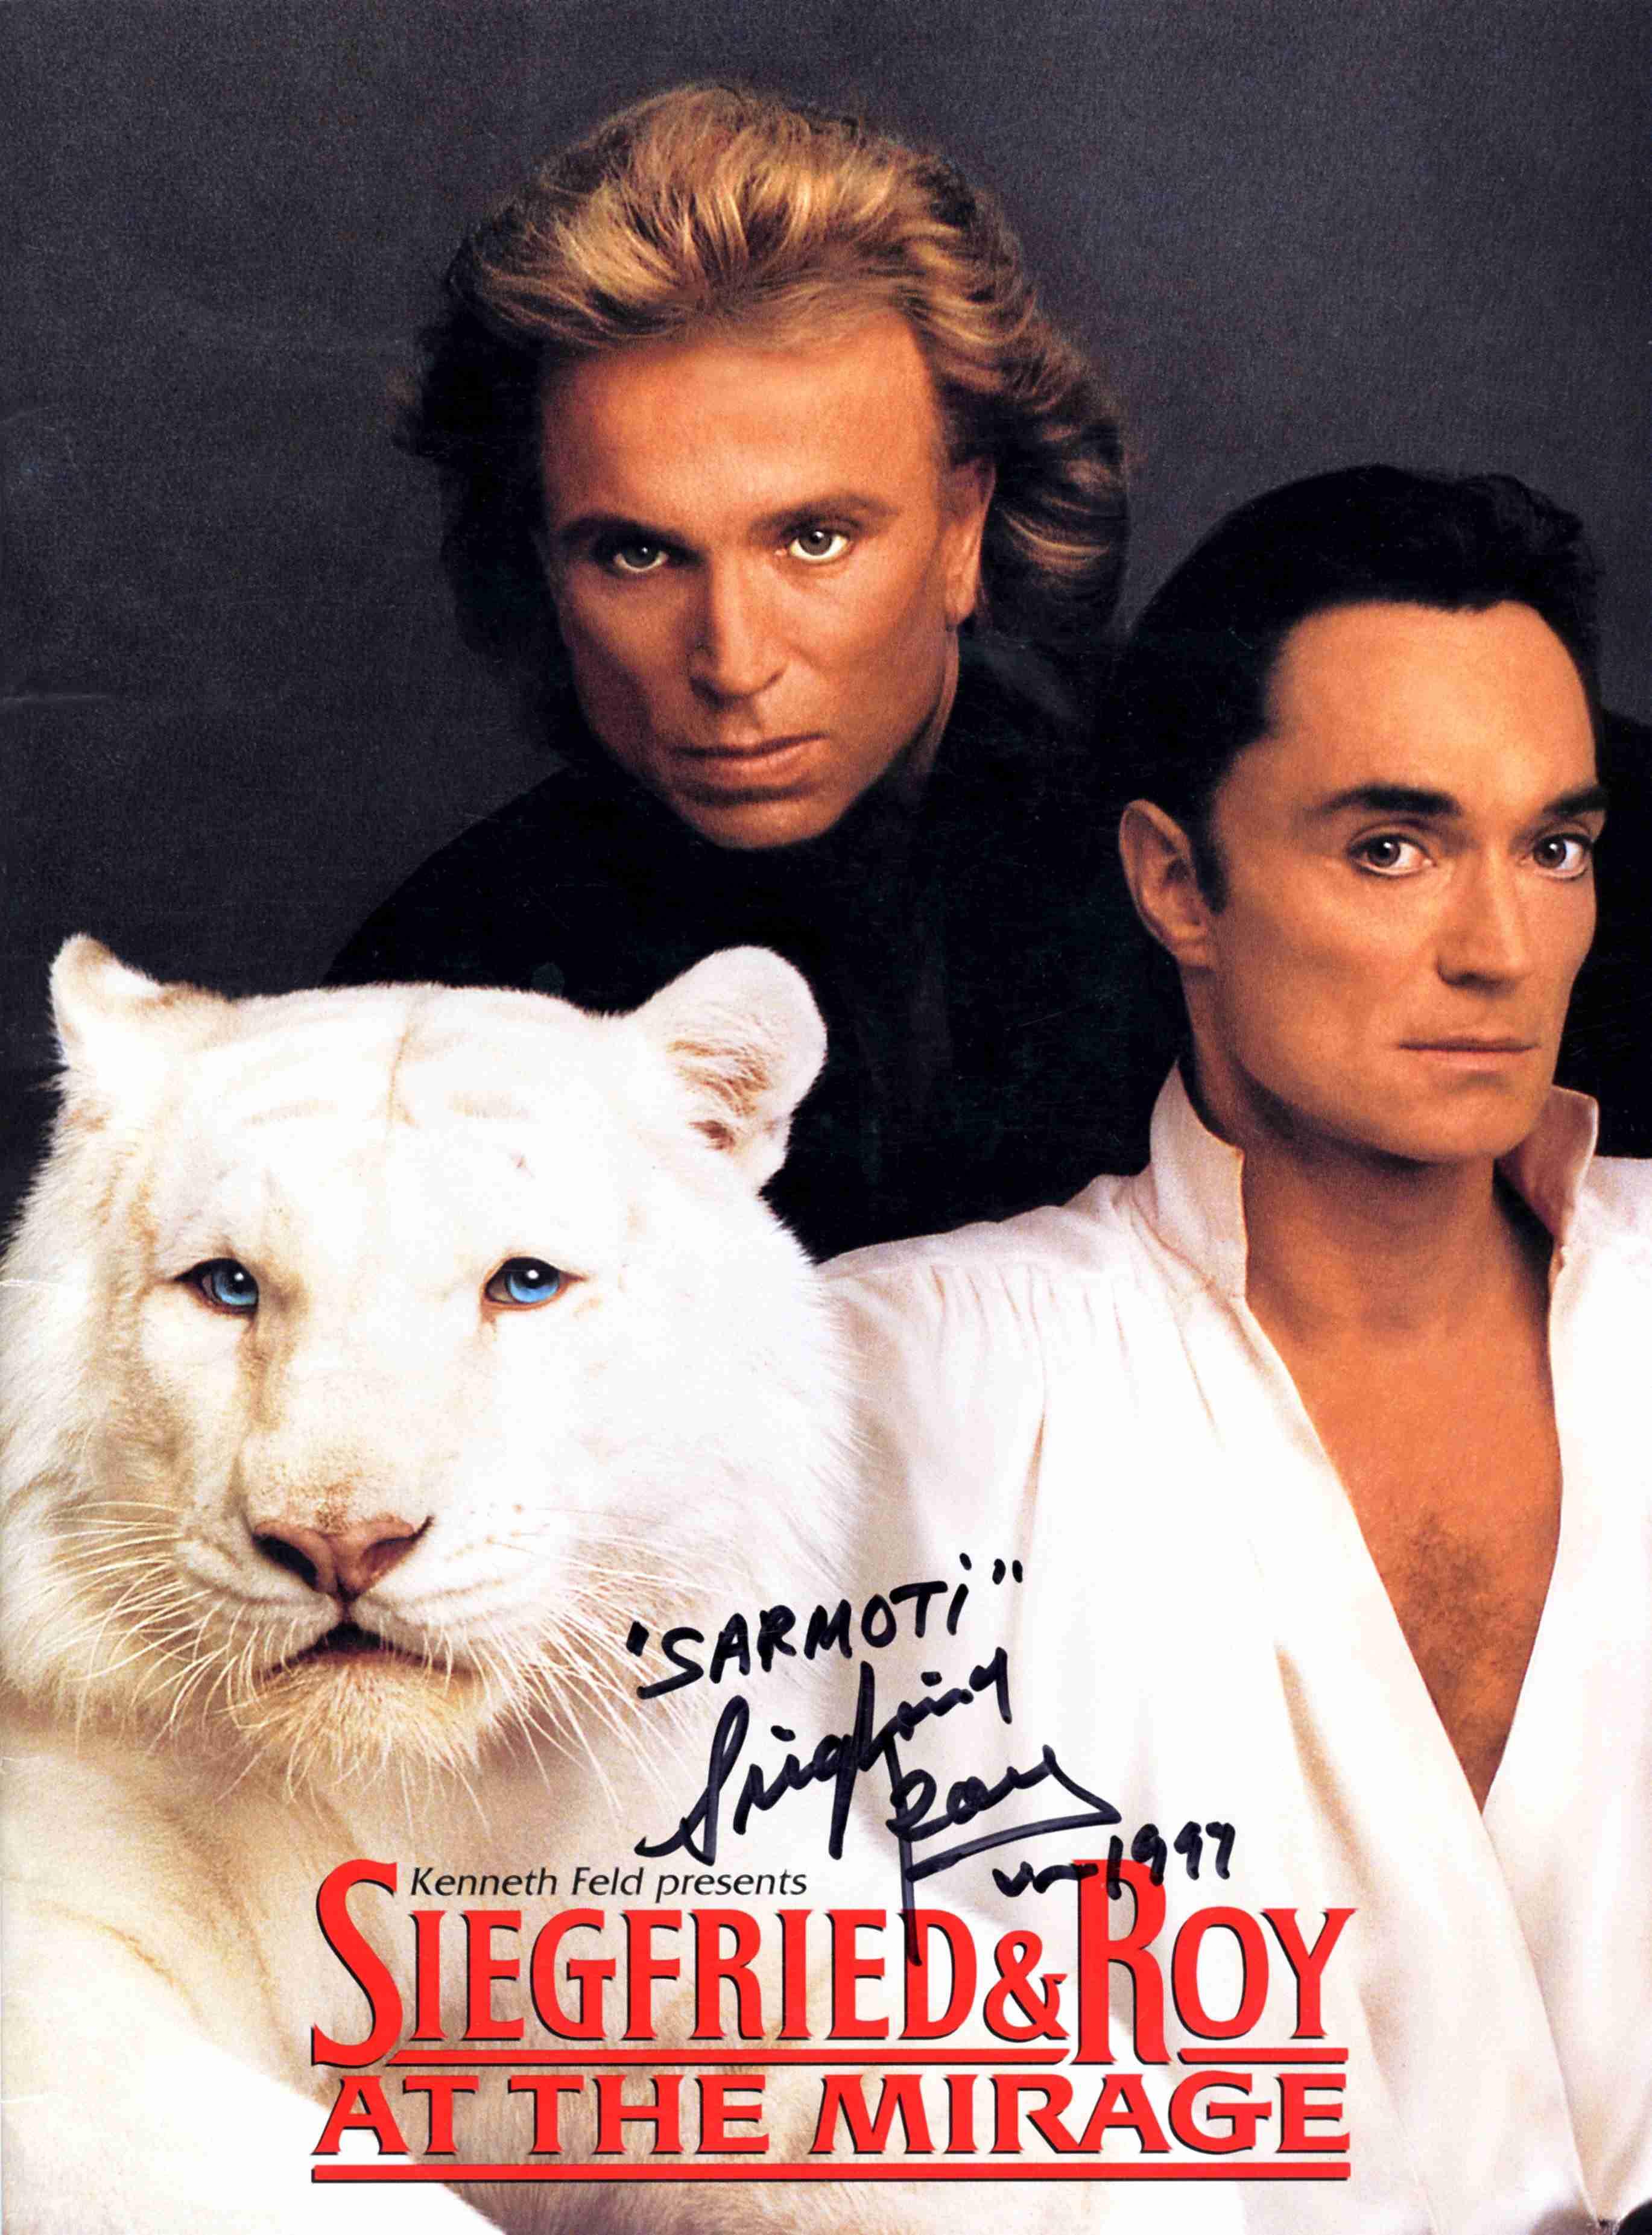 Siegfried and Roy - Beautiful Photos